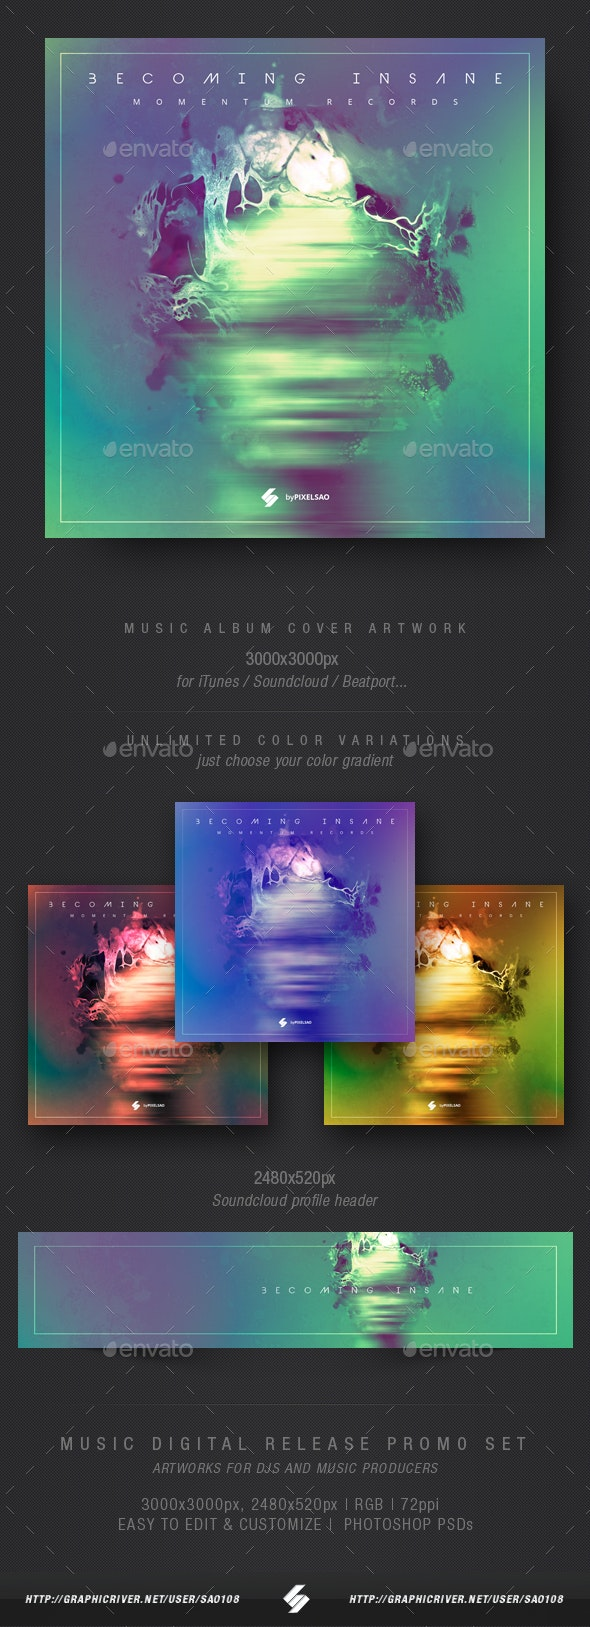 Becoming Insane - Music Album Cover Artwork Template - Miscellaneous Social Media